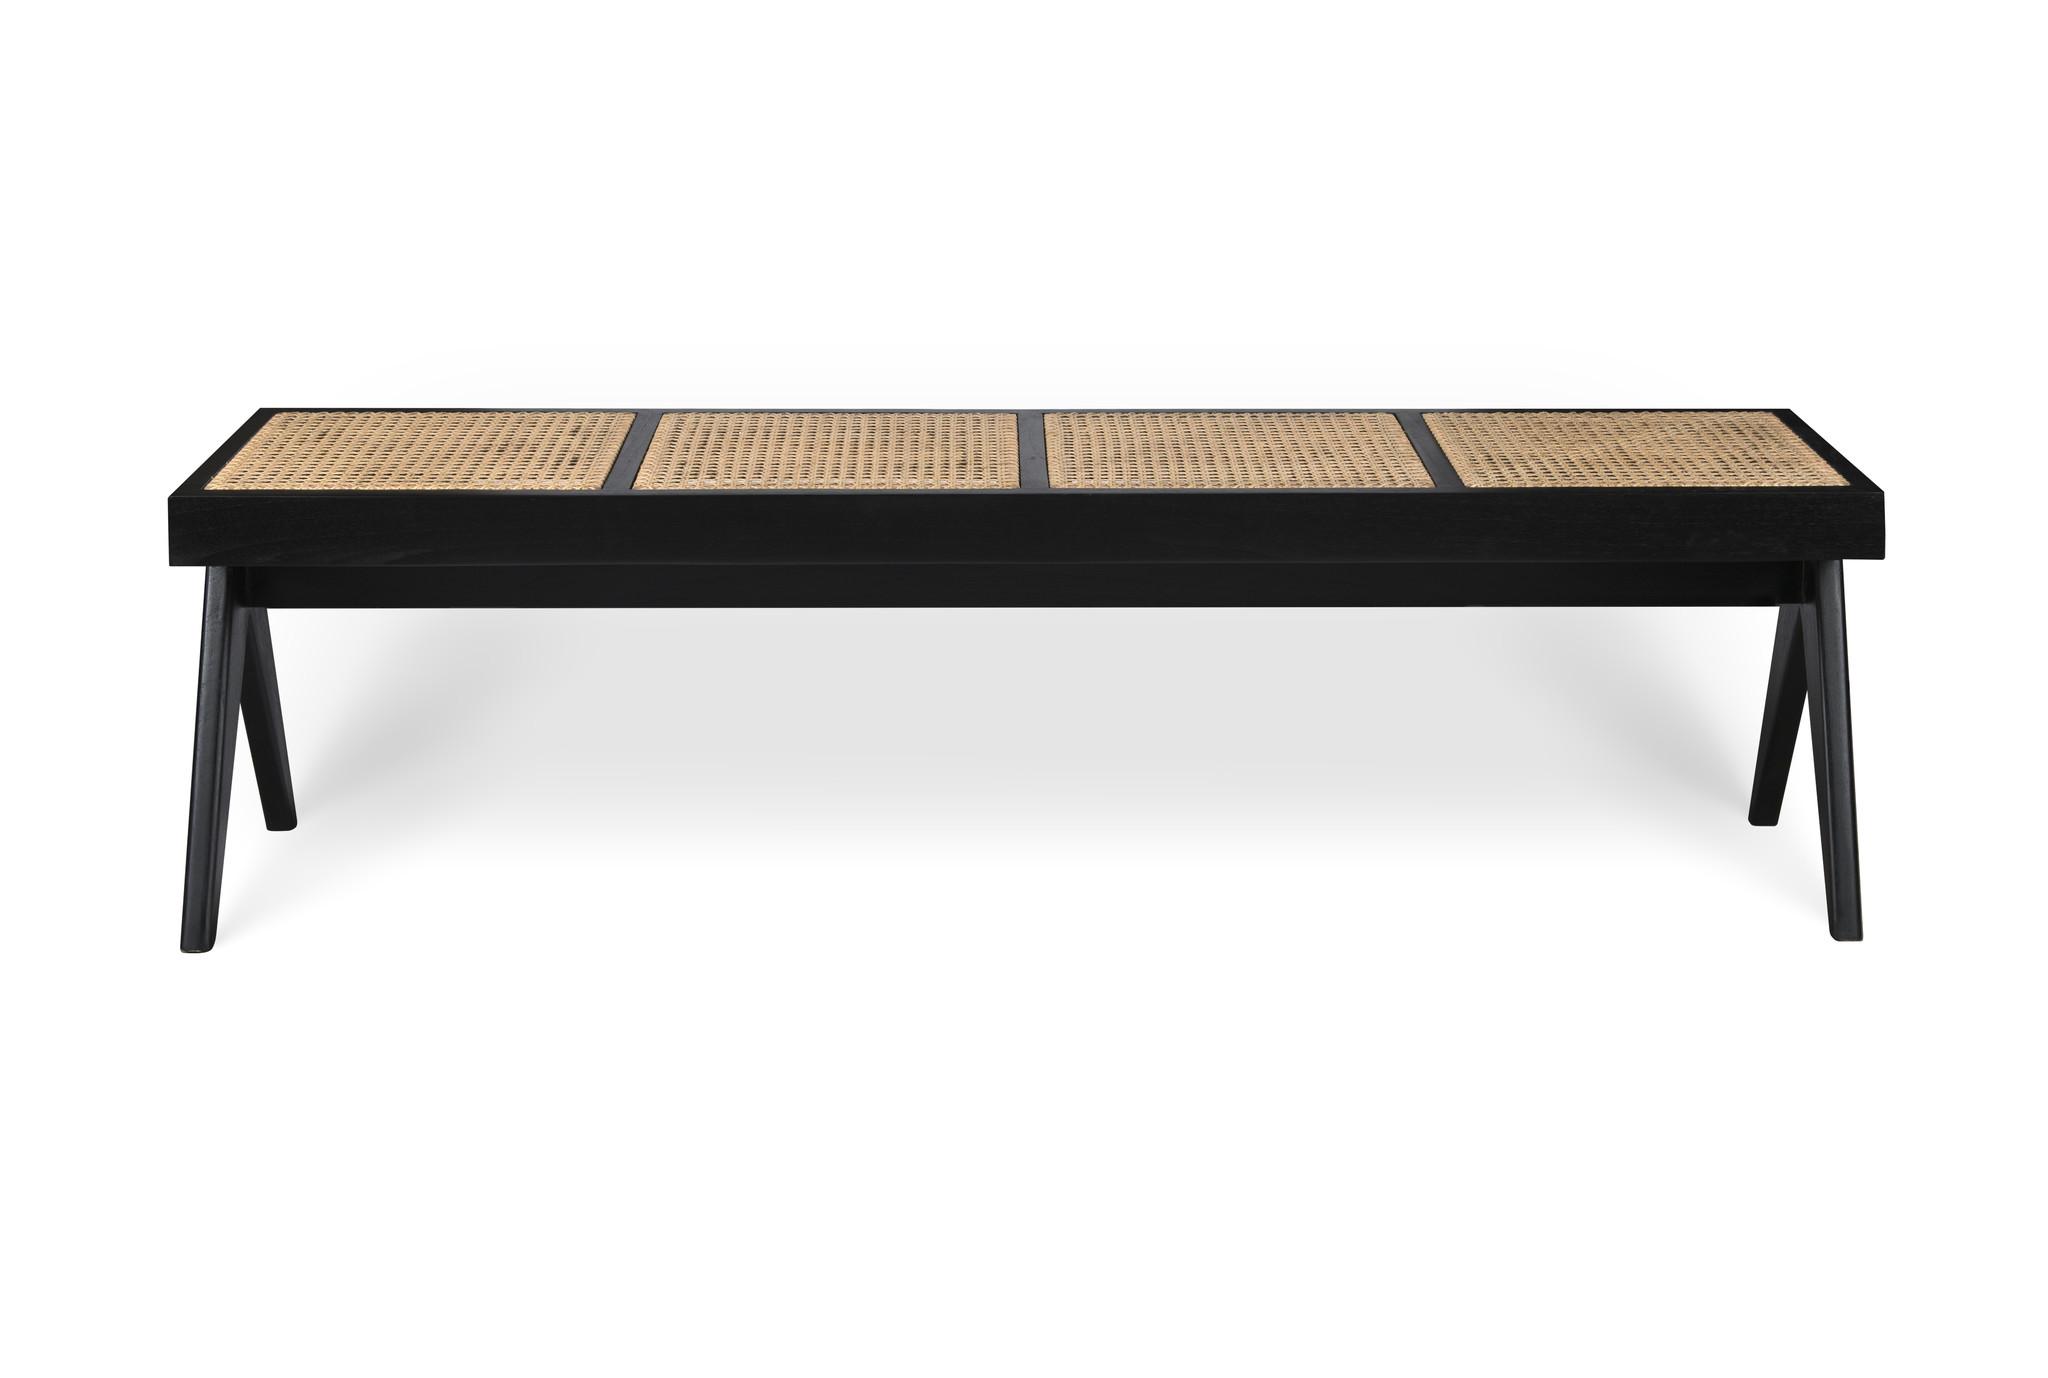 Bench / B.T.H. Flats 4-2